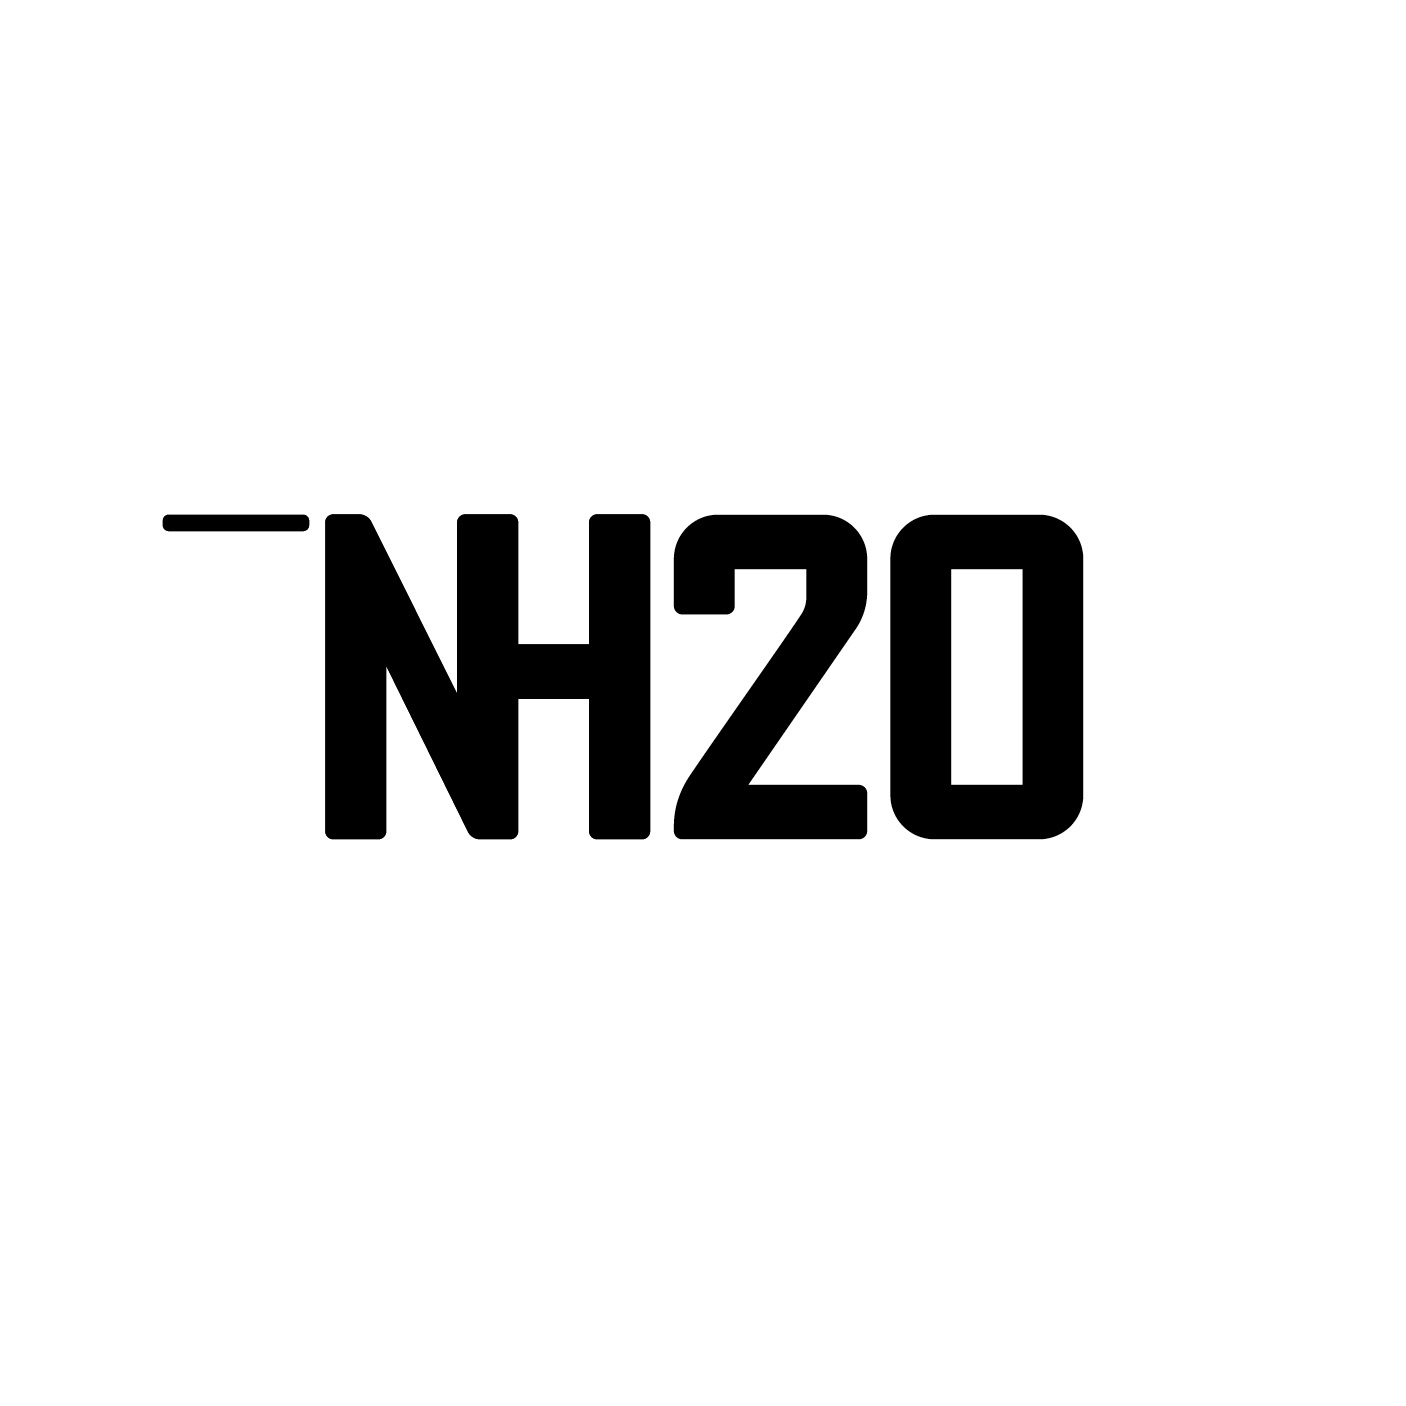 Nowe Horyzonty logo